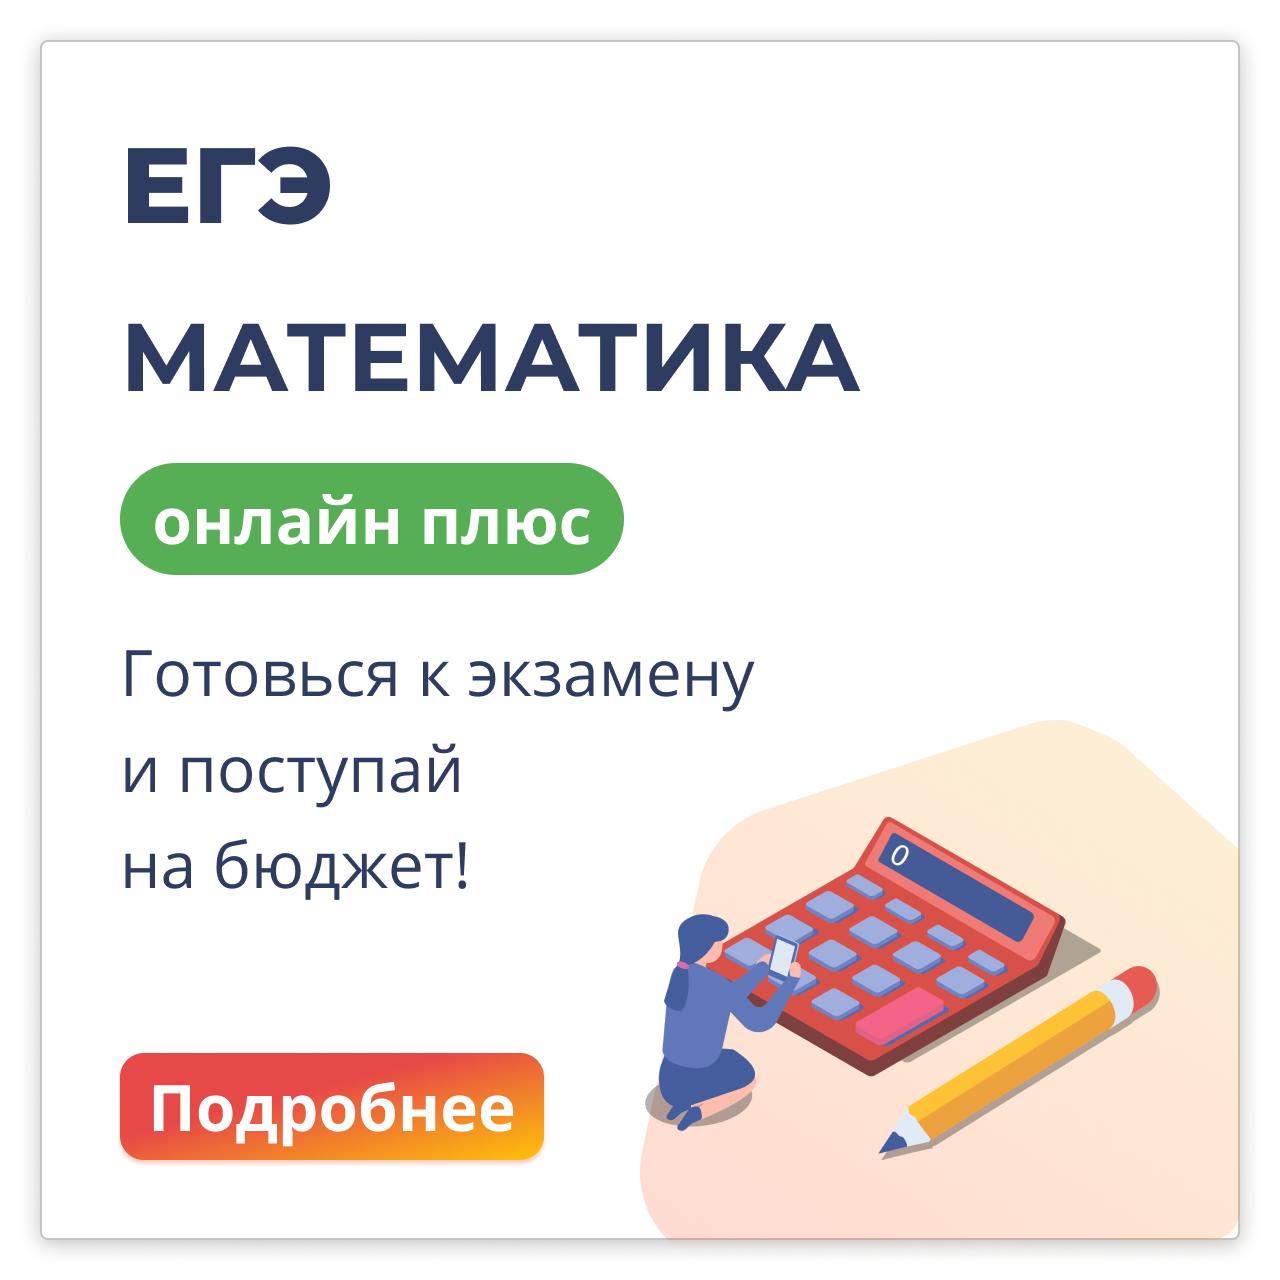 Математика ЕГЭ Онлайн-группа